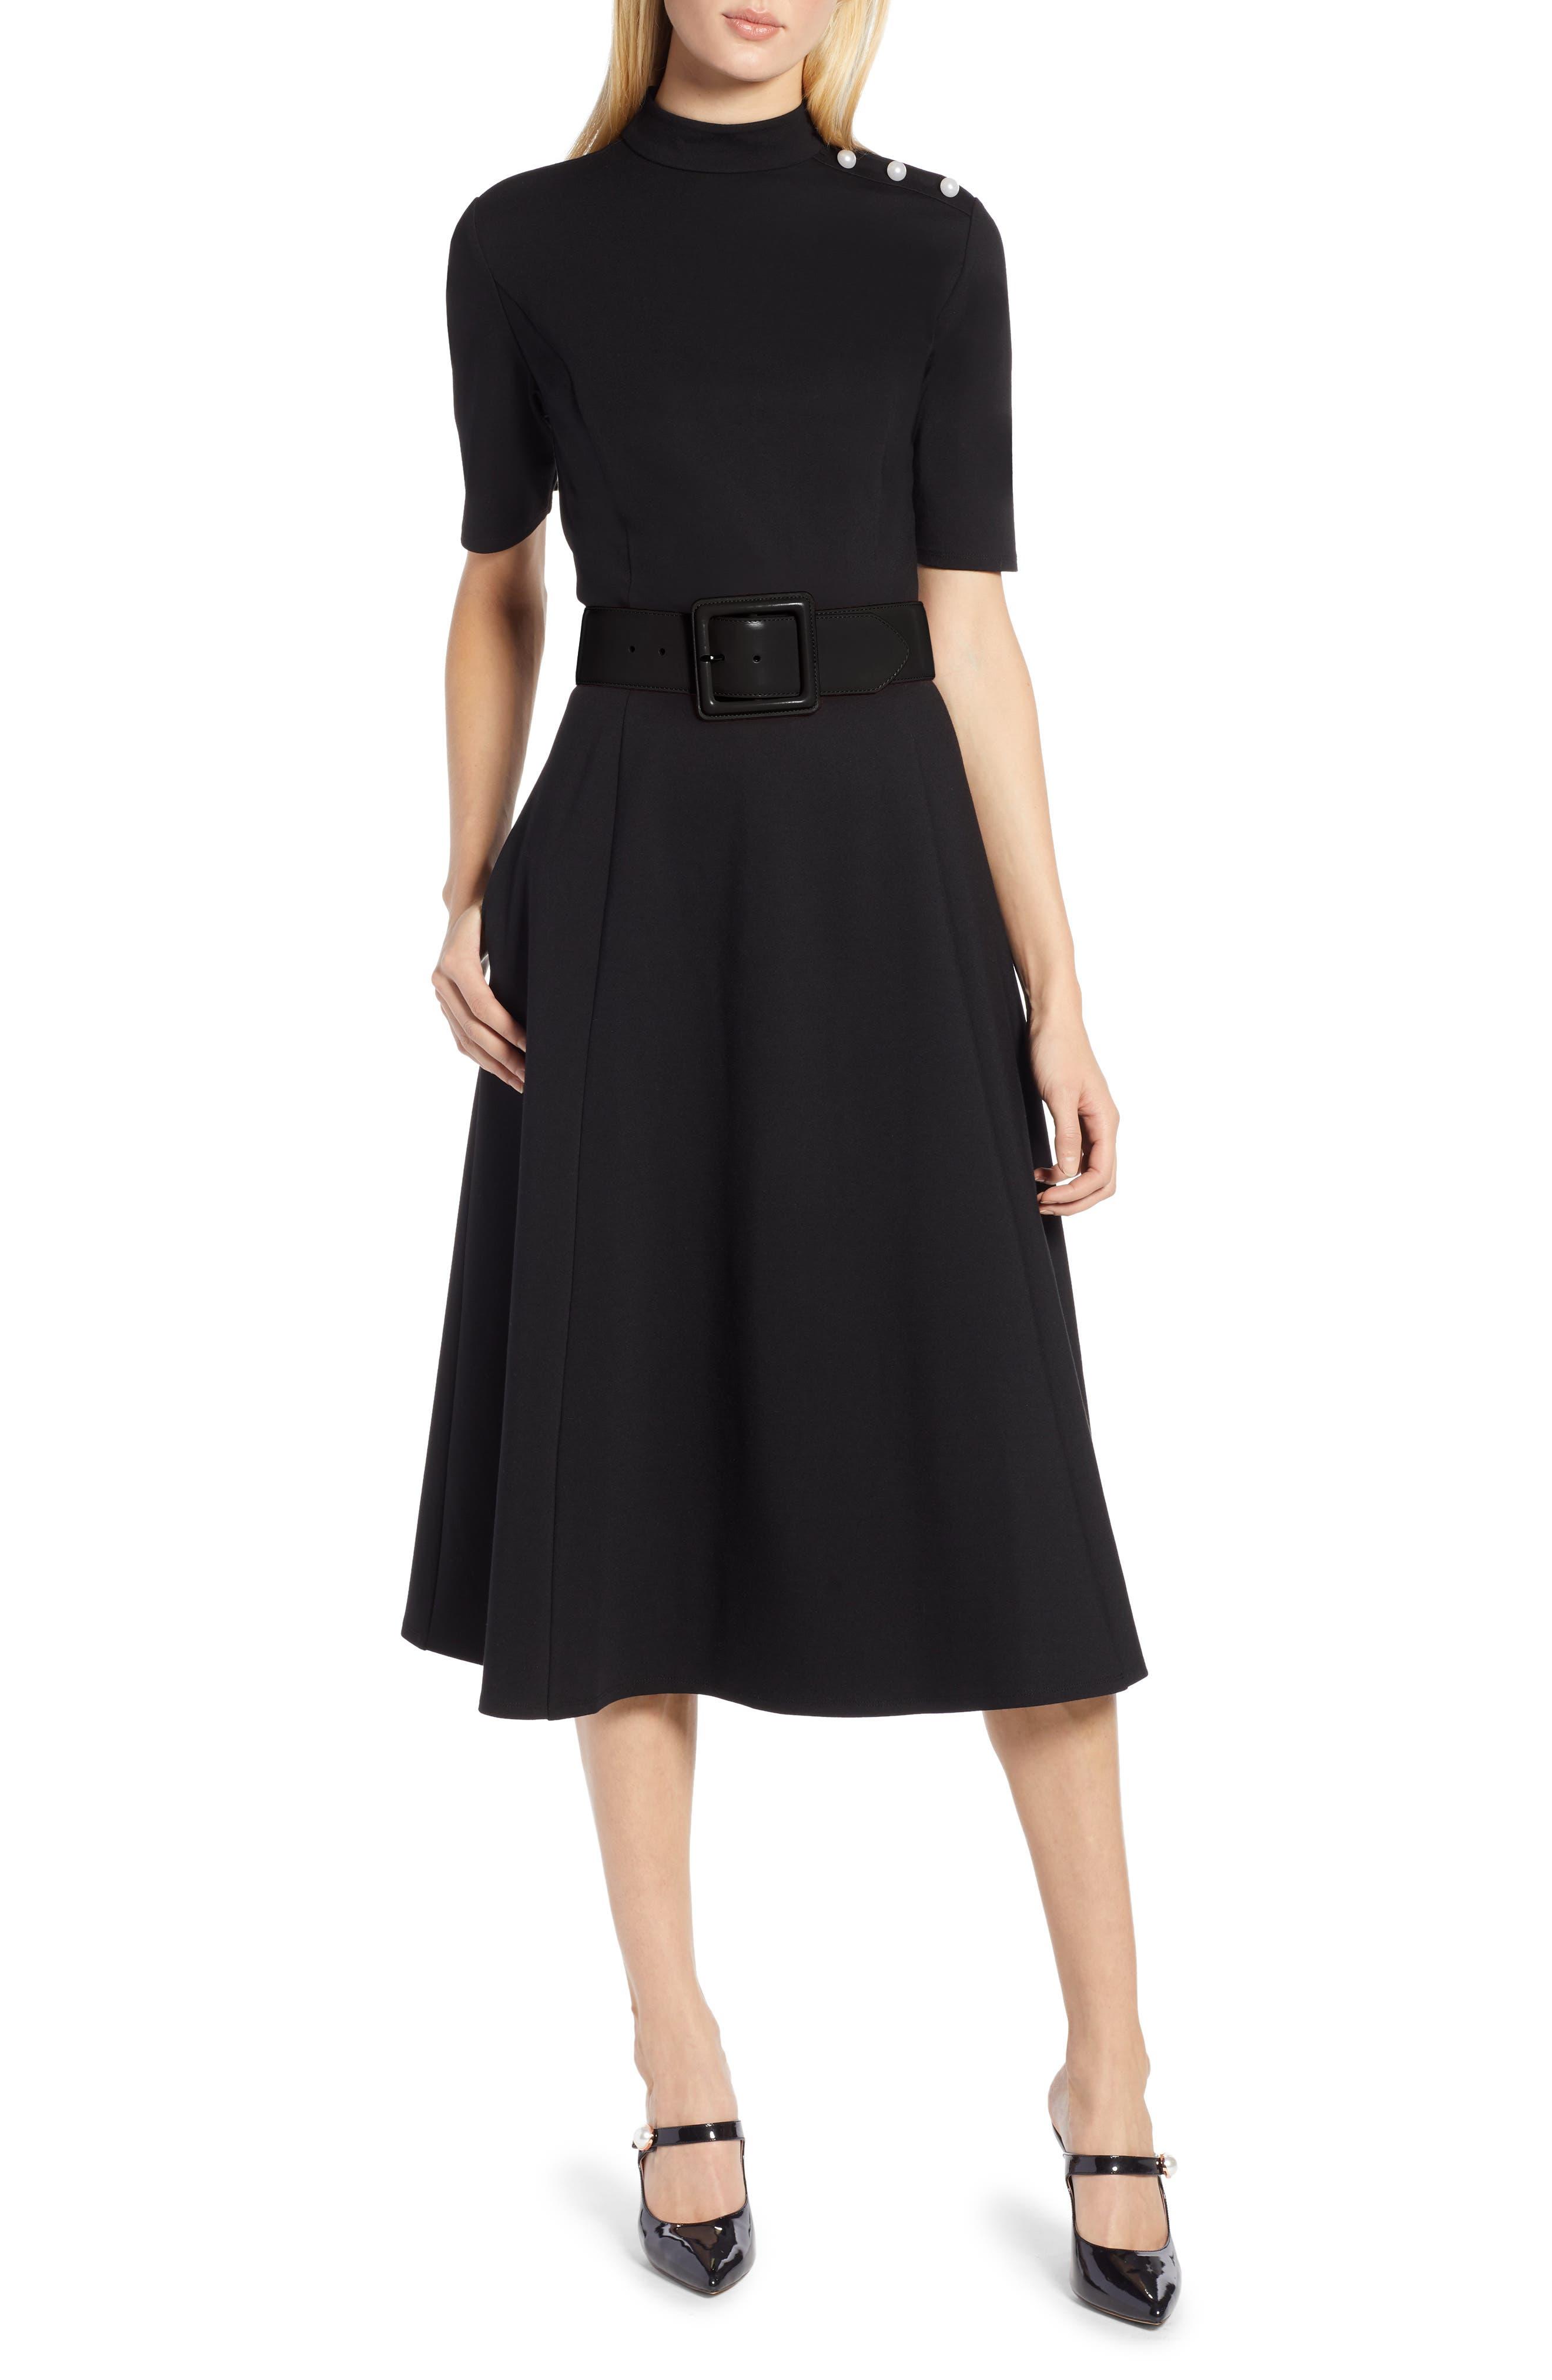 x Atlantic-Pacific Stretch Ponte Dress, Main, color, 001